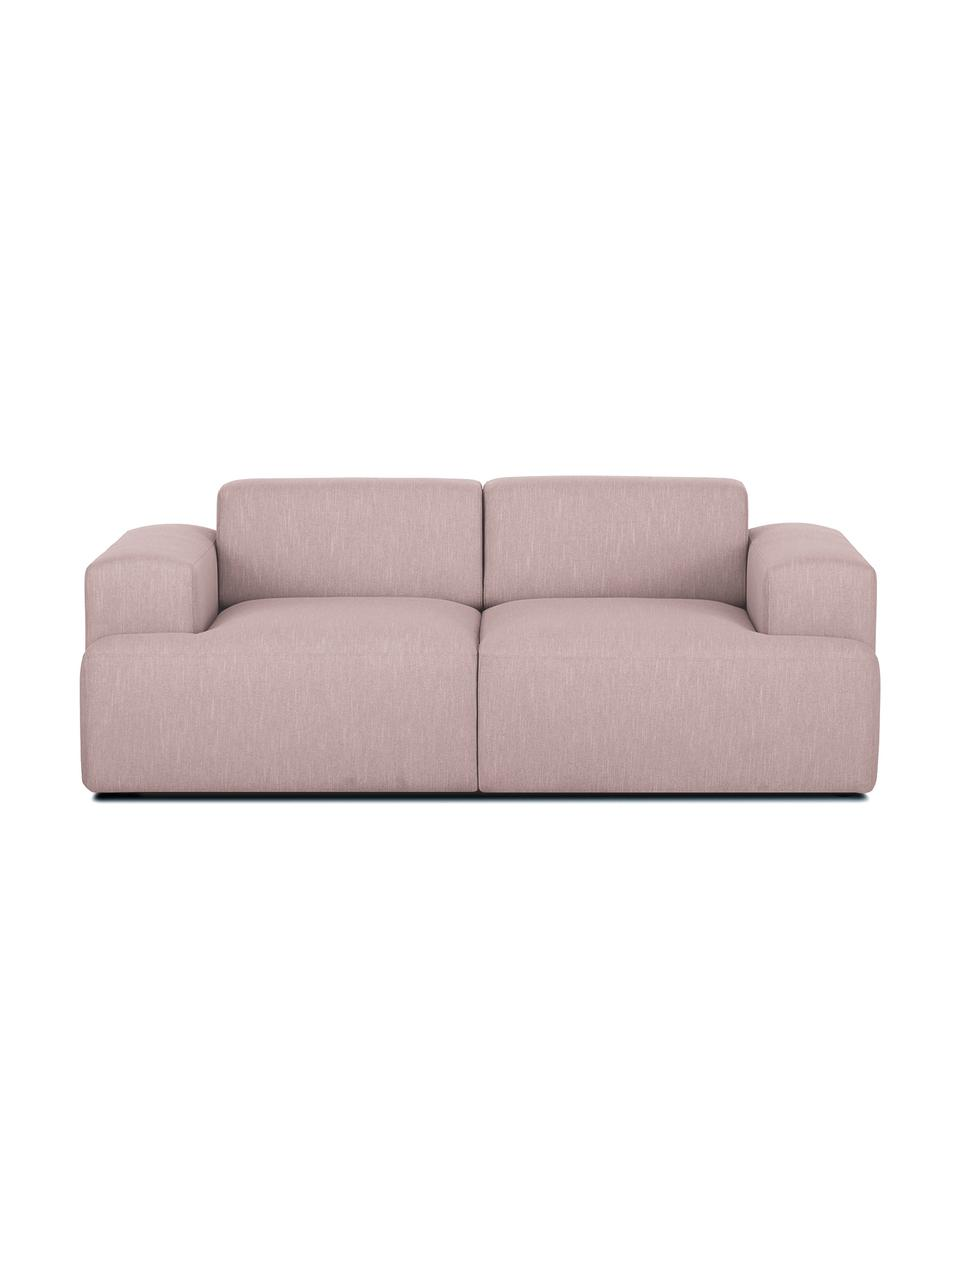 Sofa Melva (2-Sitzer) in Rosa, Bezug: Polyester Der hochwertige, Gestell: Massives Kiefernholz, Spa, Füße: Kiefernholz Die Füße befi, Webstoff Rosa, B 200 x T 101 cm